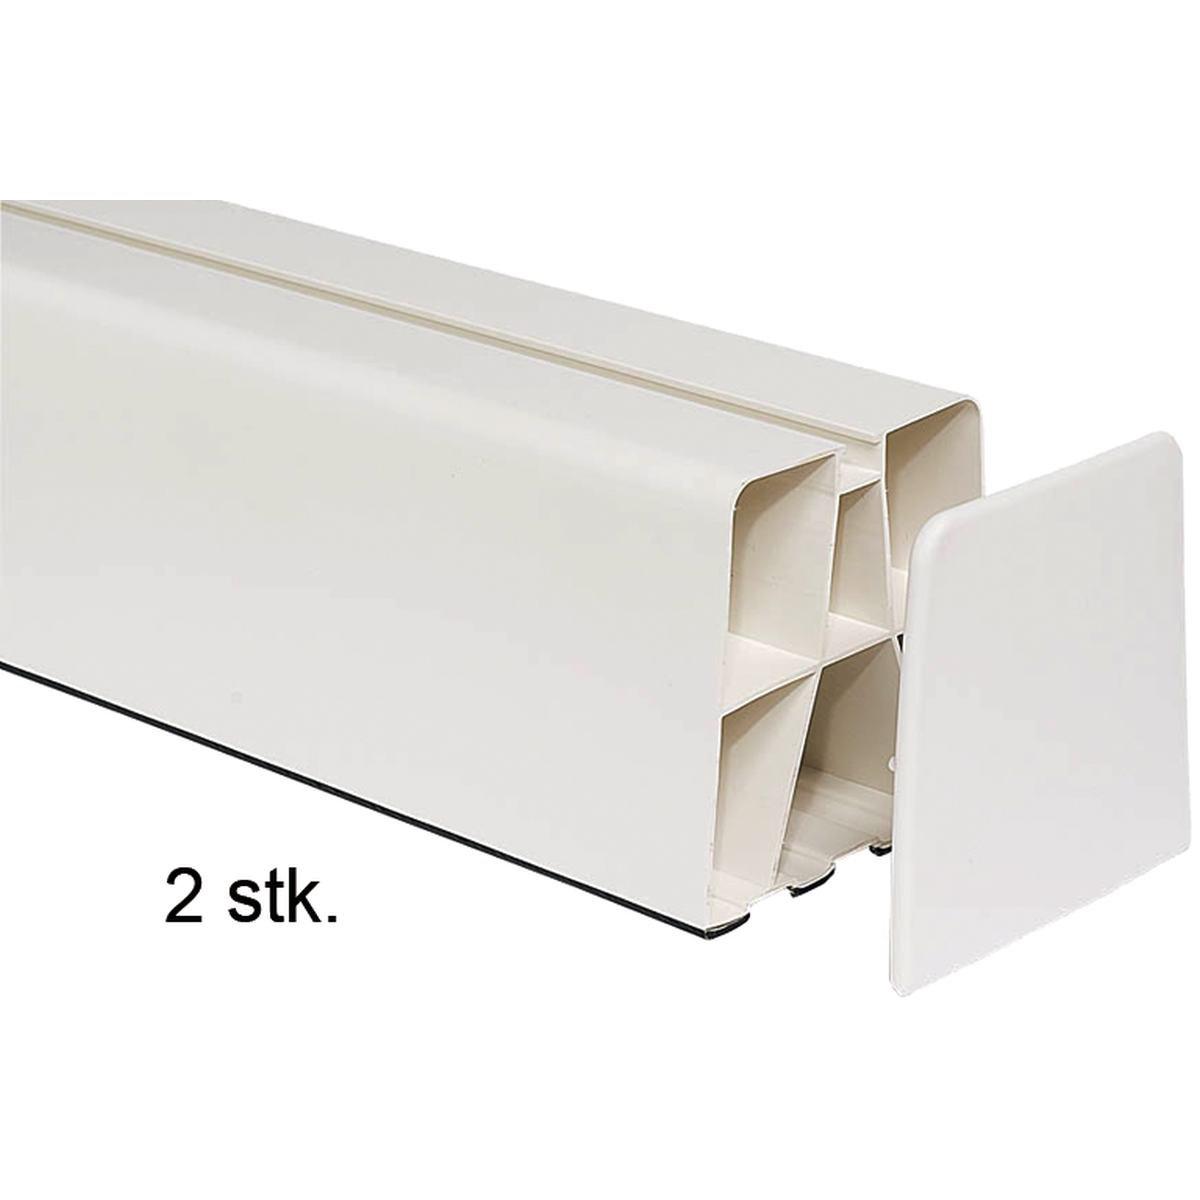 Montasjeblokk med endelokk 80 x 100 x 450 mm. pakk